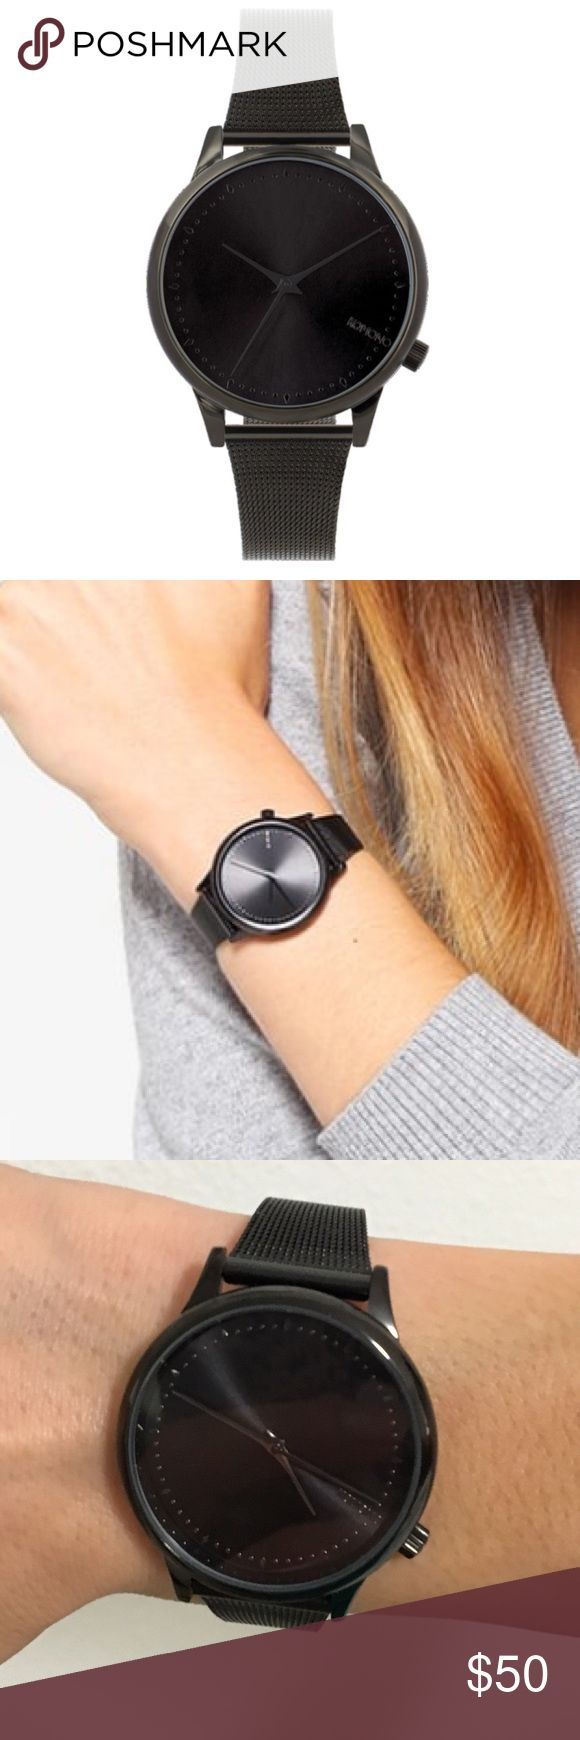 Komono black stainless steel watch - worn once Japanese Quartz Movement Glossy Metal Case Stainless Steel Back Stainless Steel Mesh Wristband Case Diameter 36mm Case Water Resistant 3atm Komono Accessories Watches